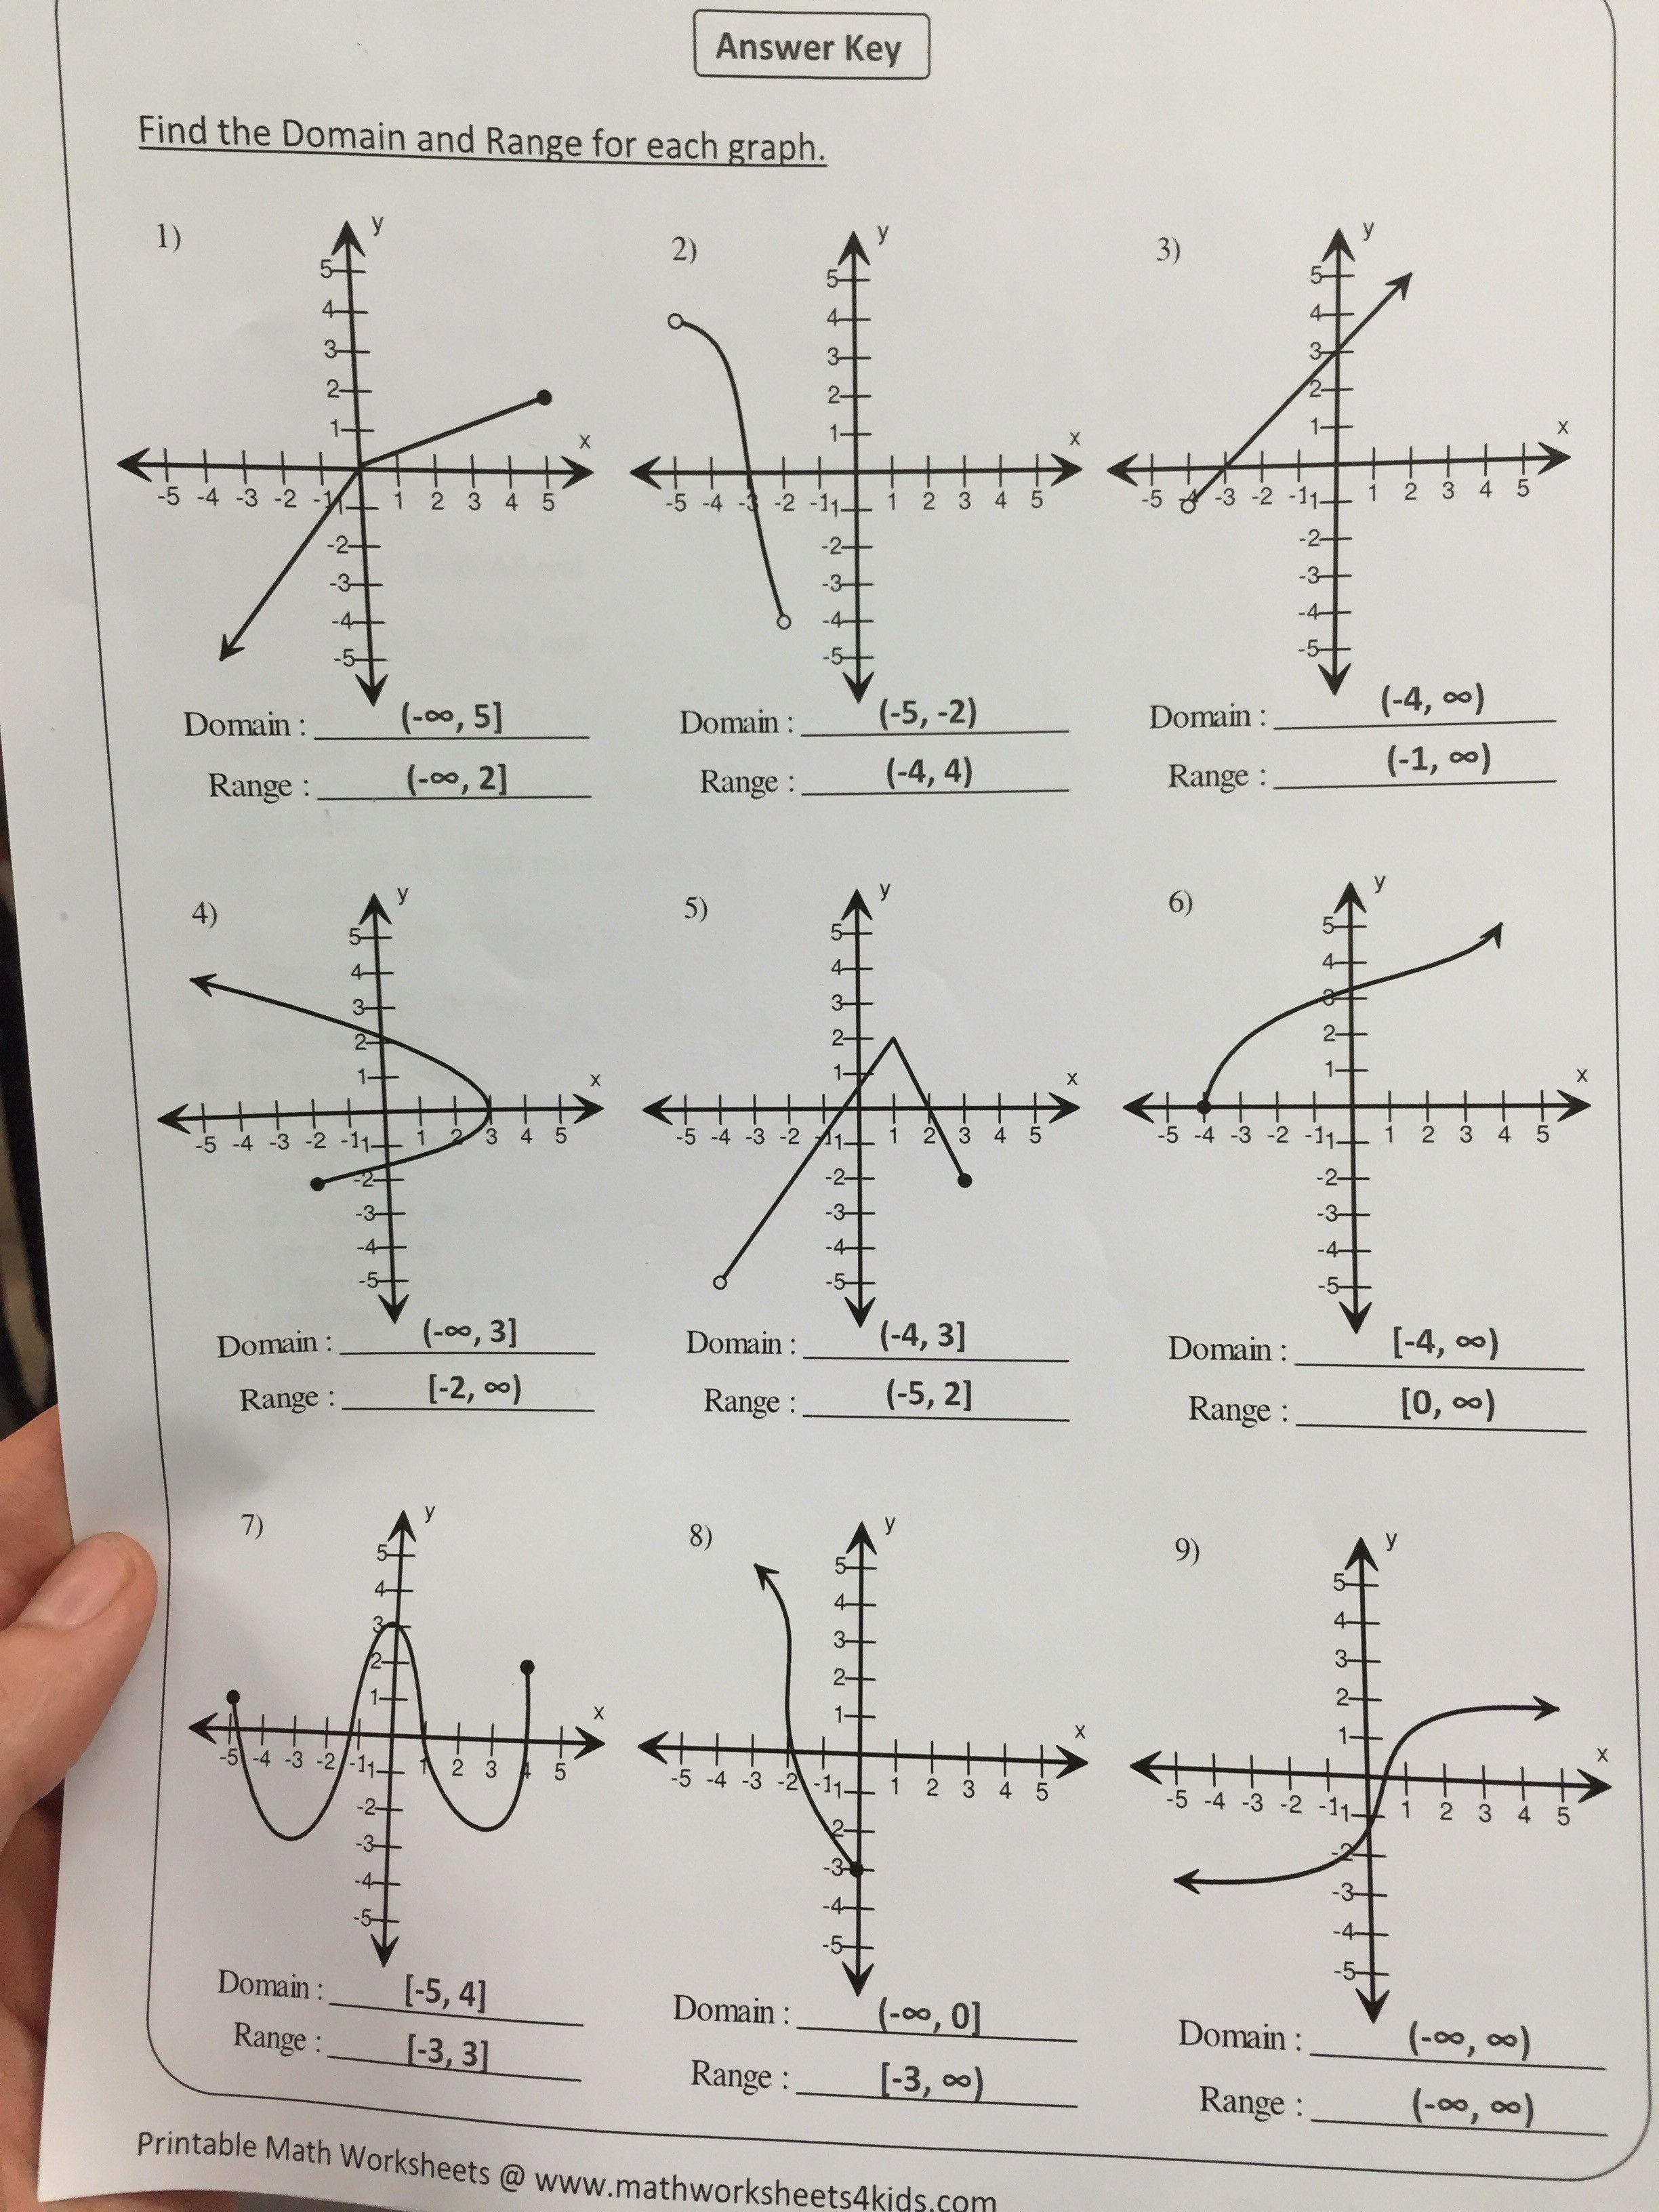 General Domain And Range Worksheet Algebra 1